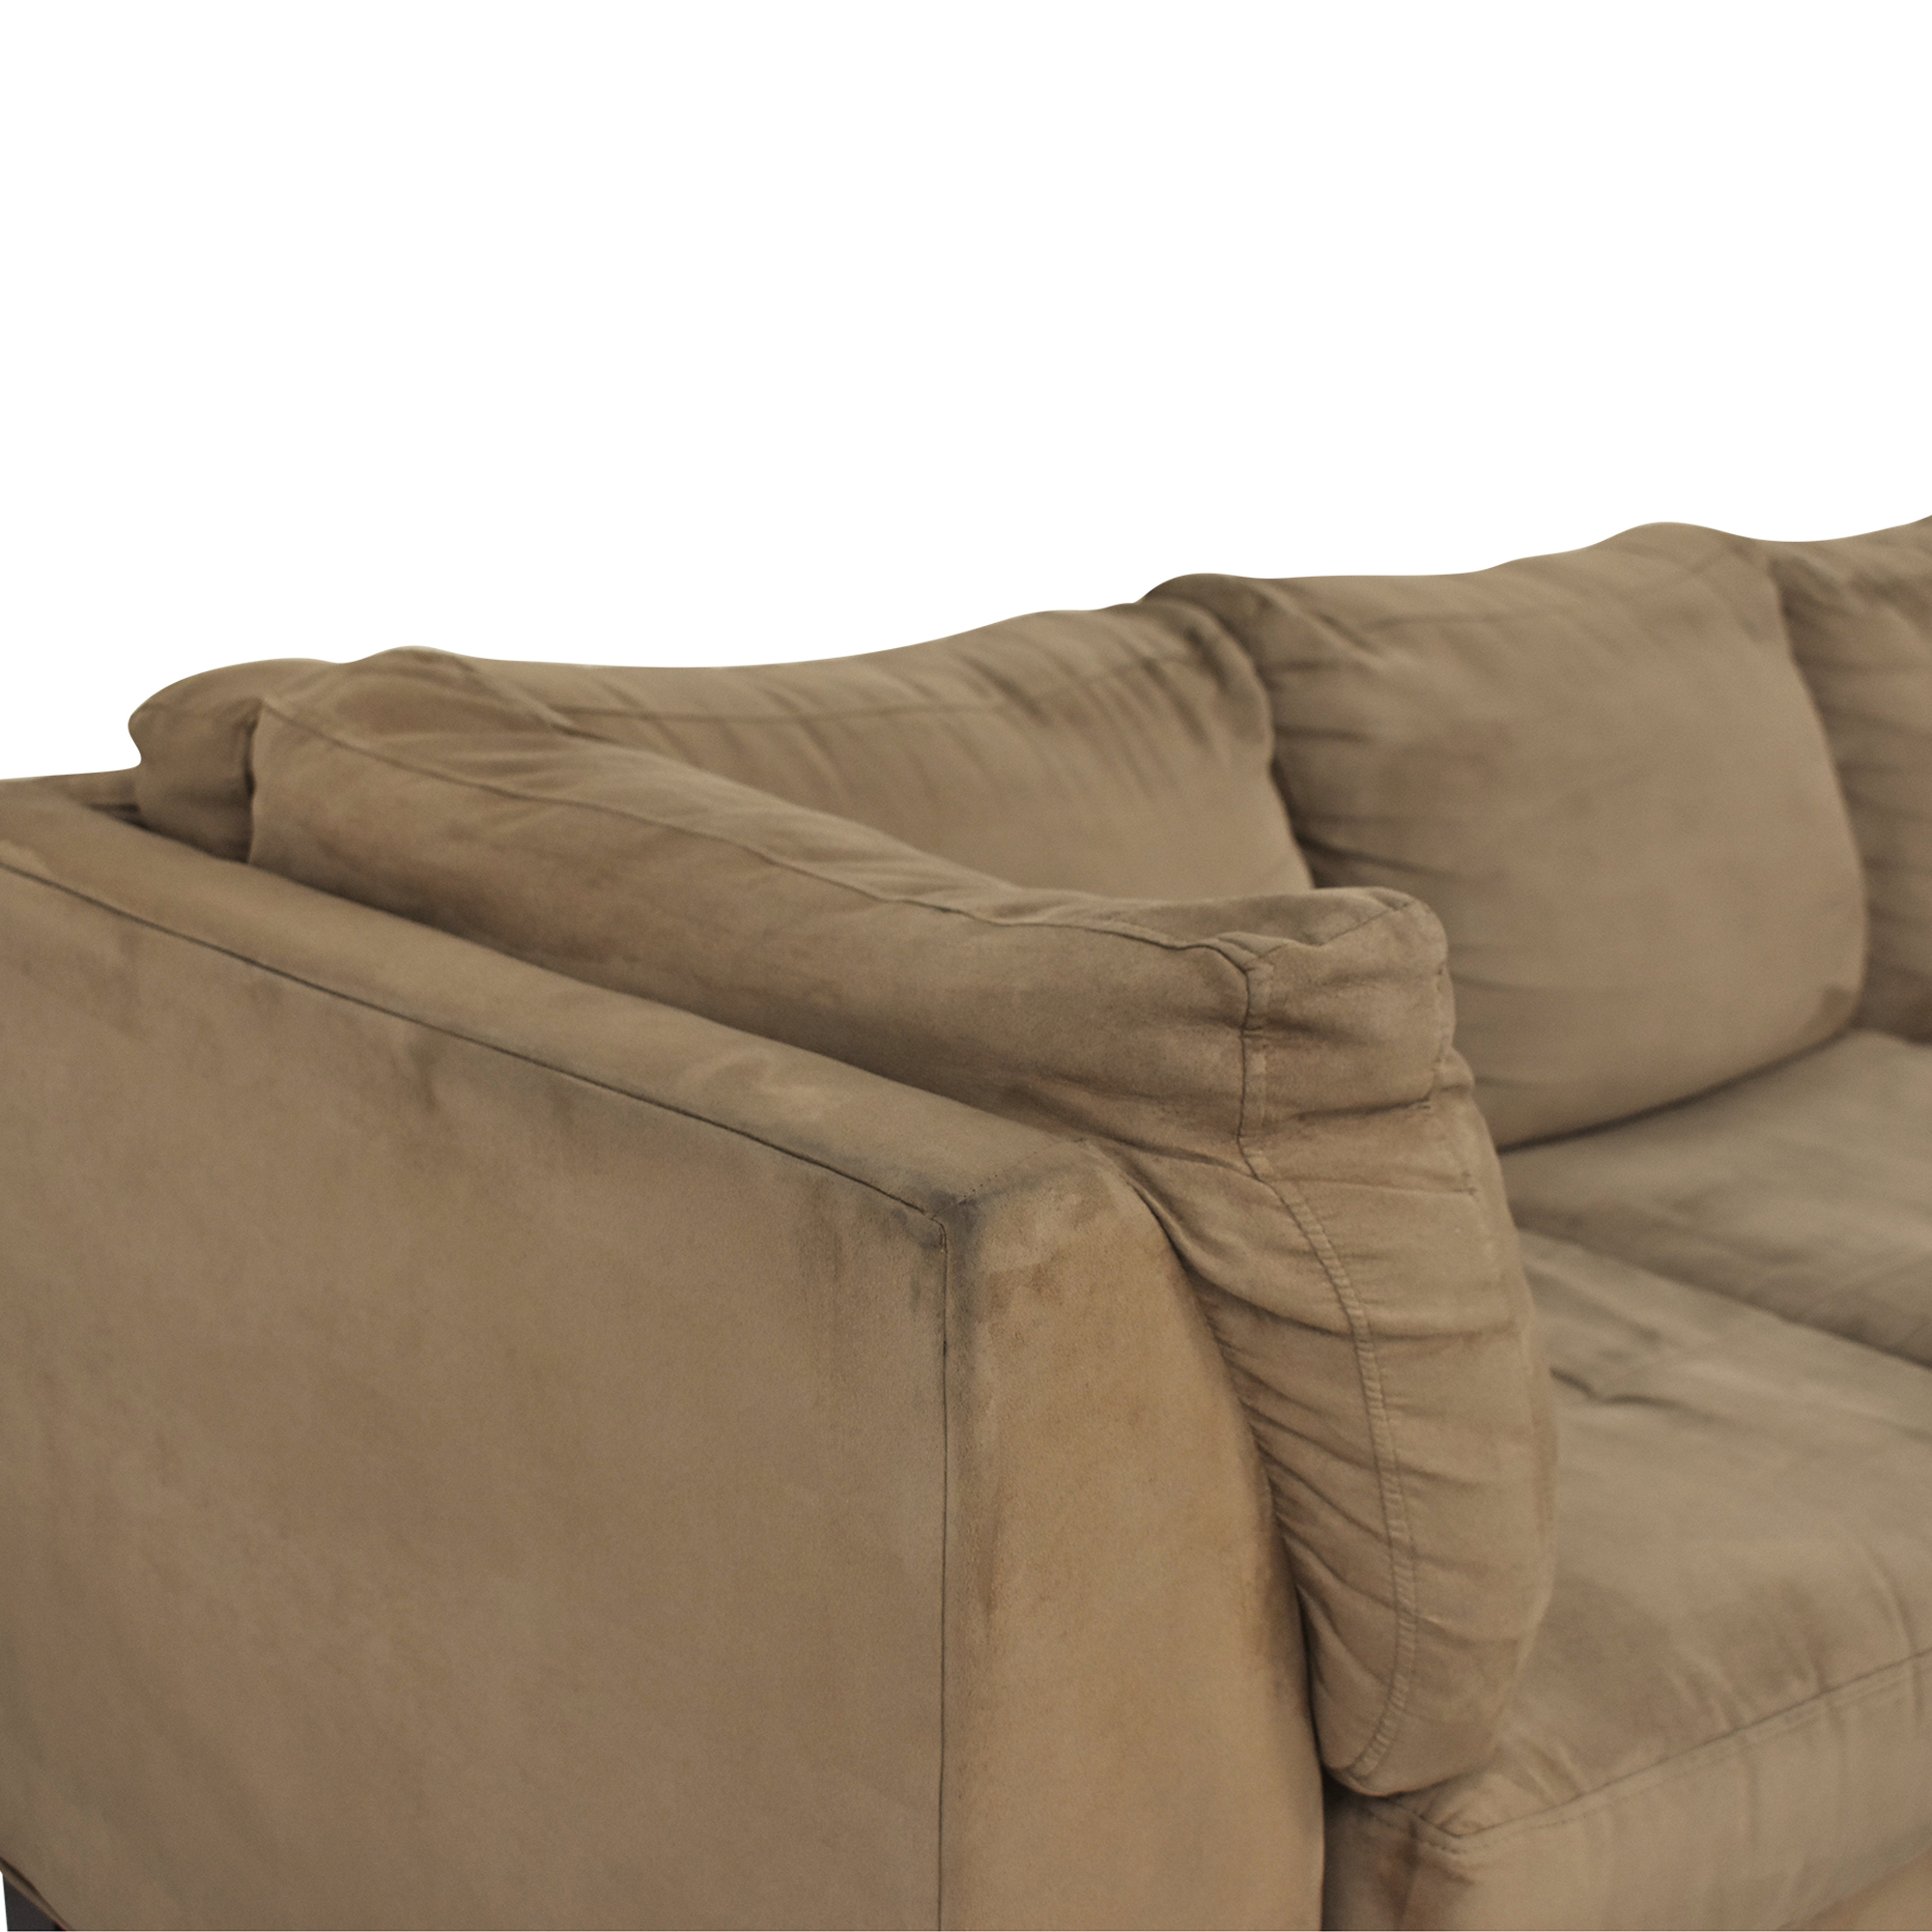 buy Raymour & Flanigan Kathy Ireland Chaise Sectional Sofa Raymour & Flanigan